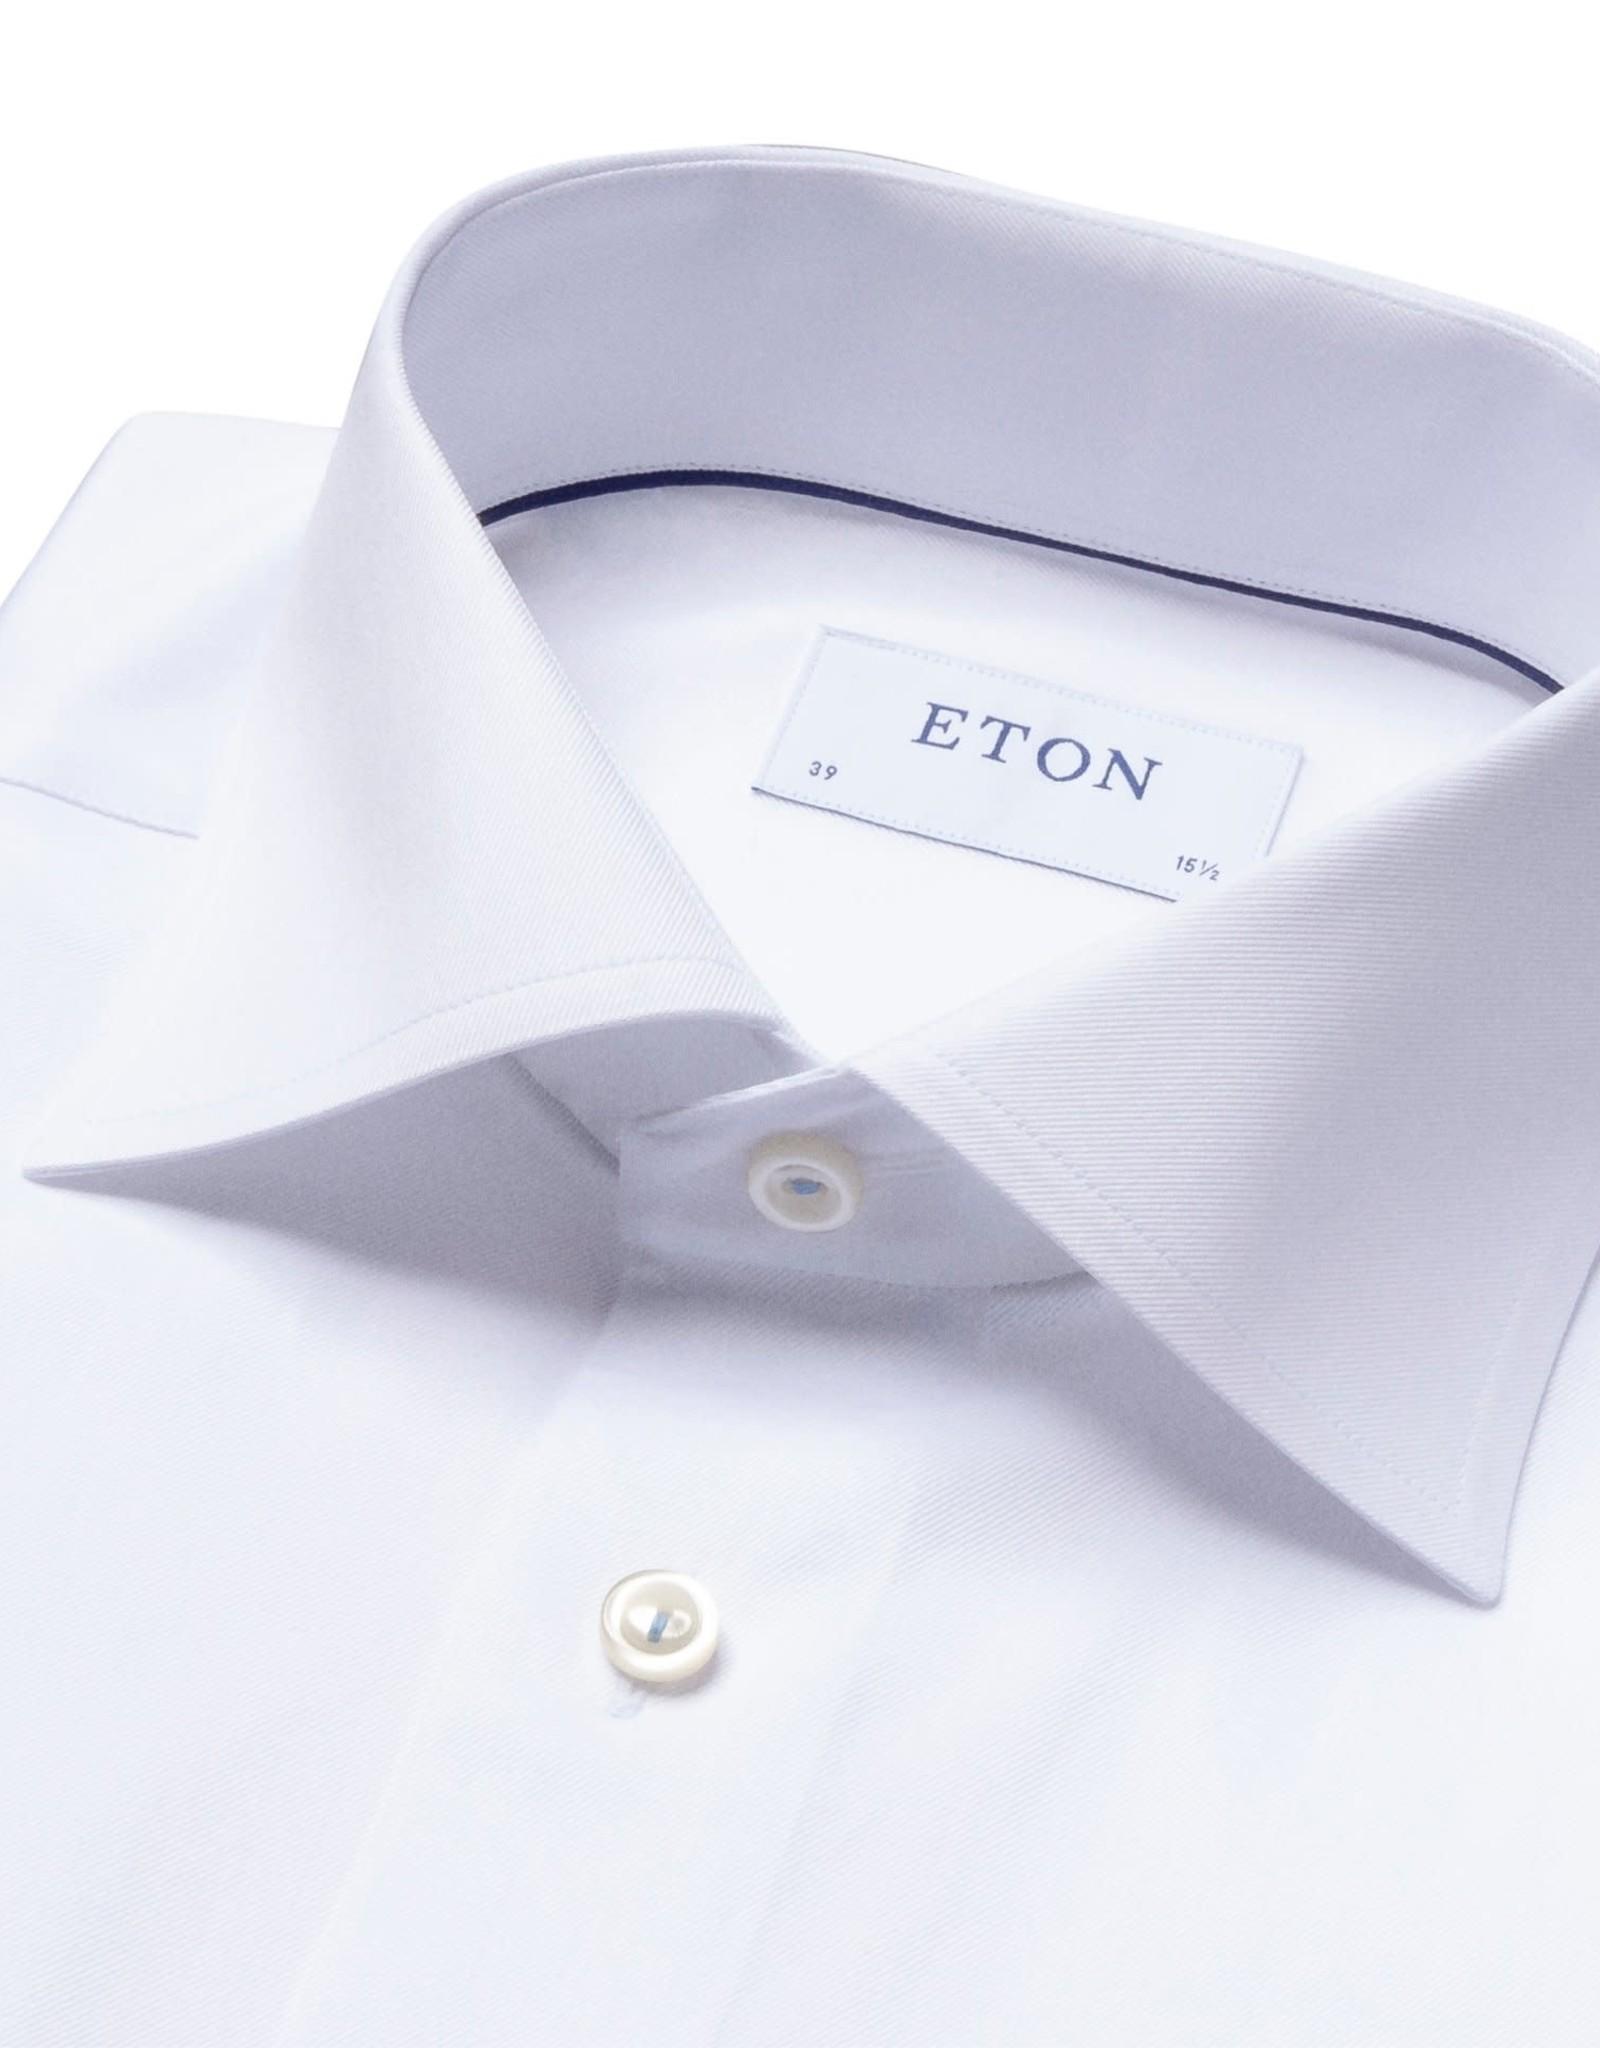 Eton Eton hemd wit classic 1051/01